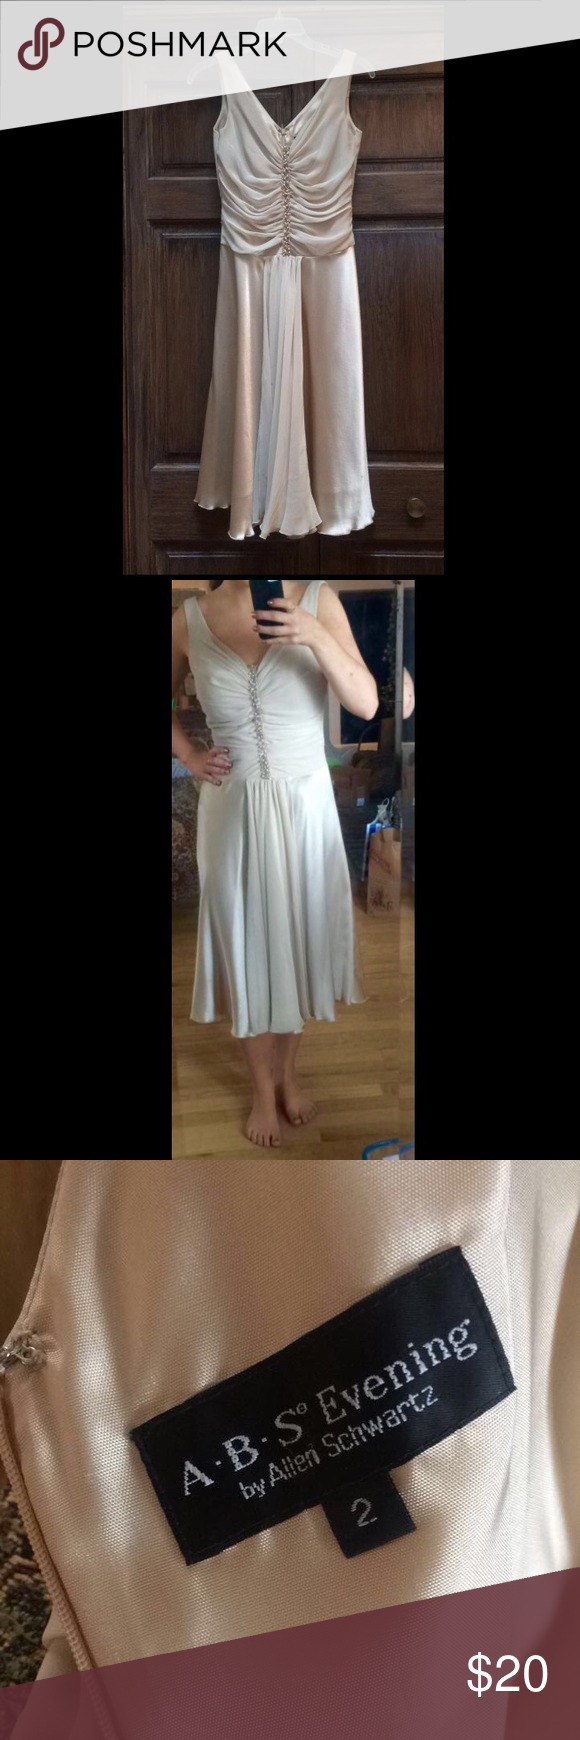 Allen Schwartz dress! Size 2 Allen Schwartz dress! Size 2 ABS Allen Schwartz Dresses